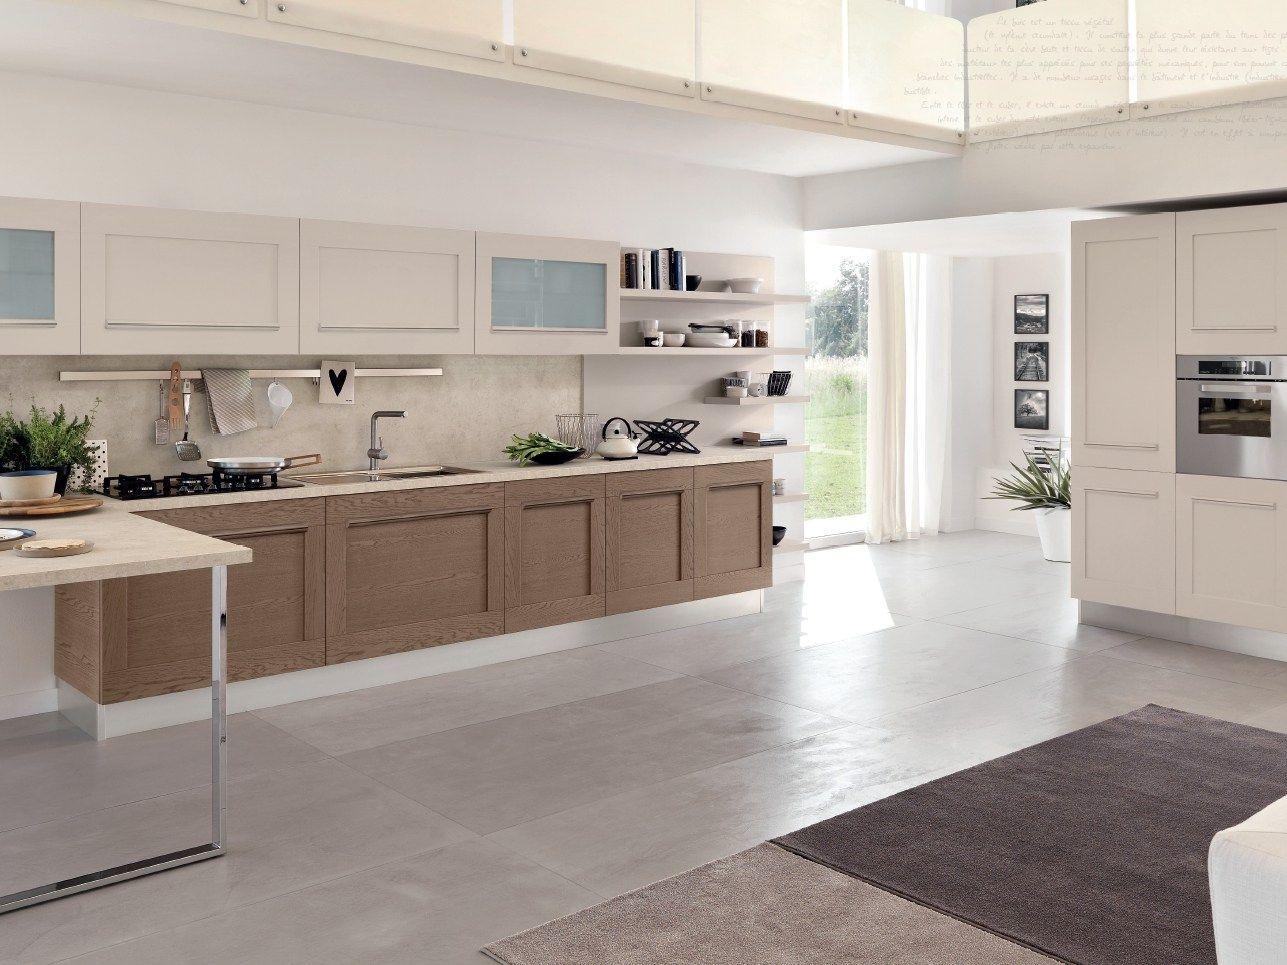 Gallery linear kitchen by cucine lube design studio ferriani for Linear kitchen design